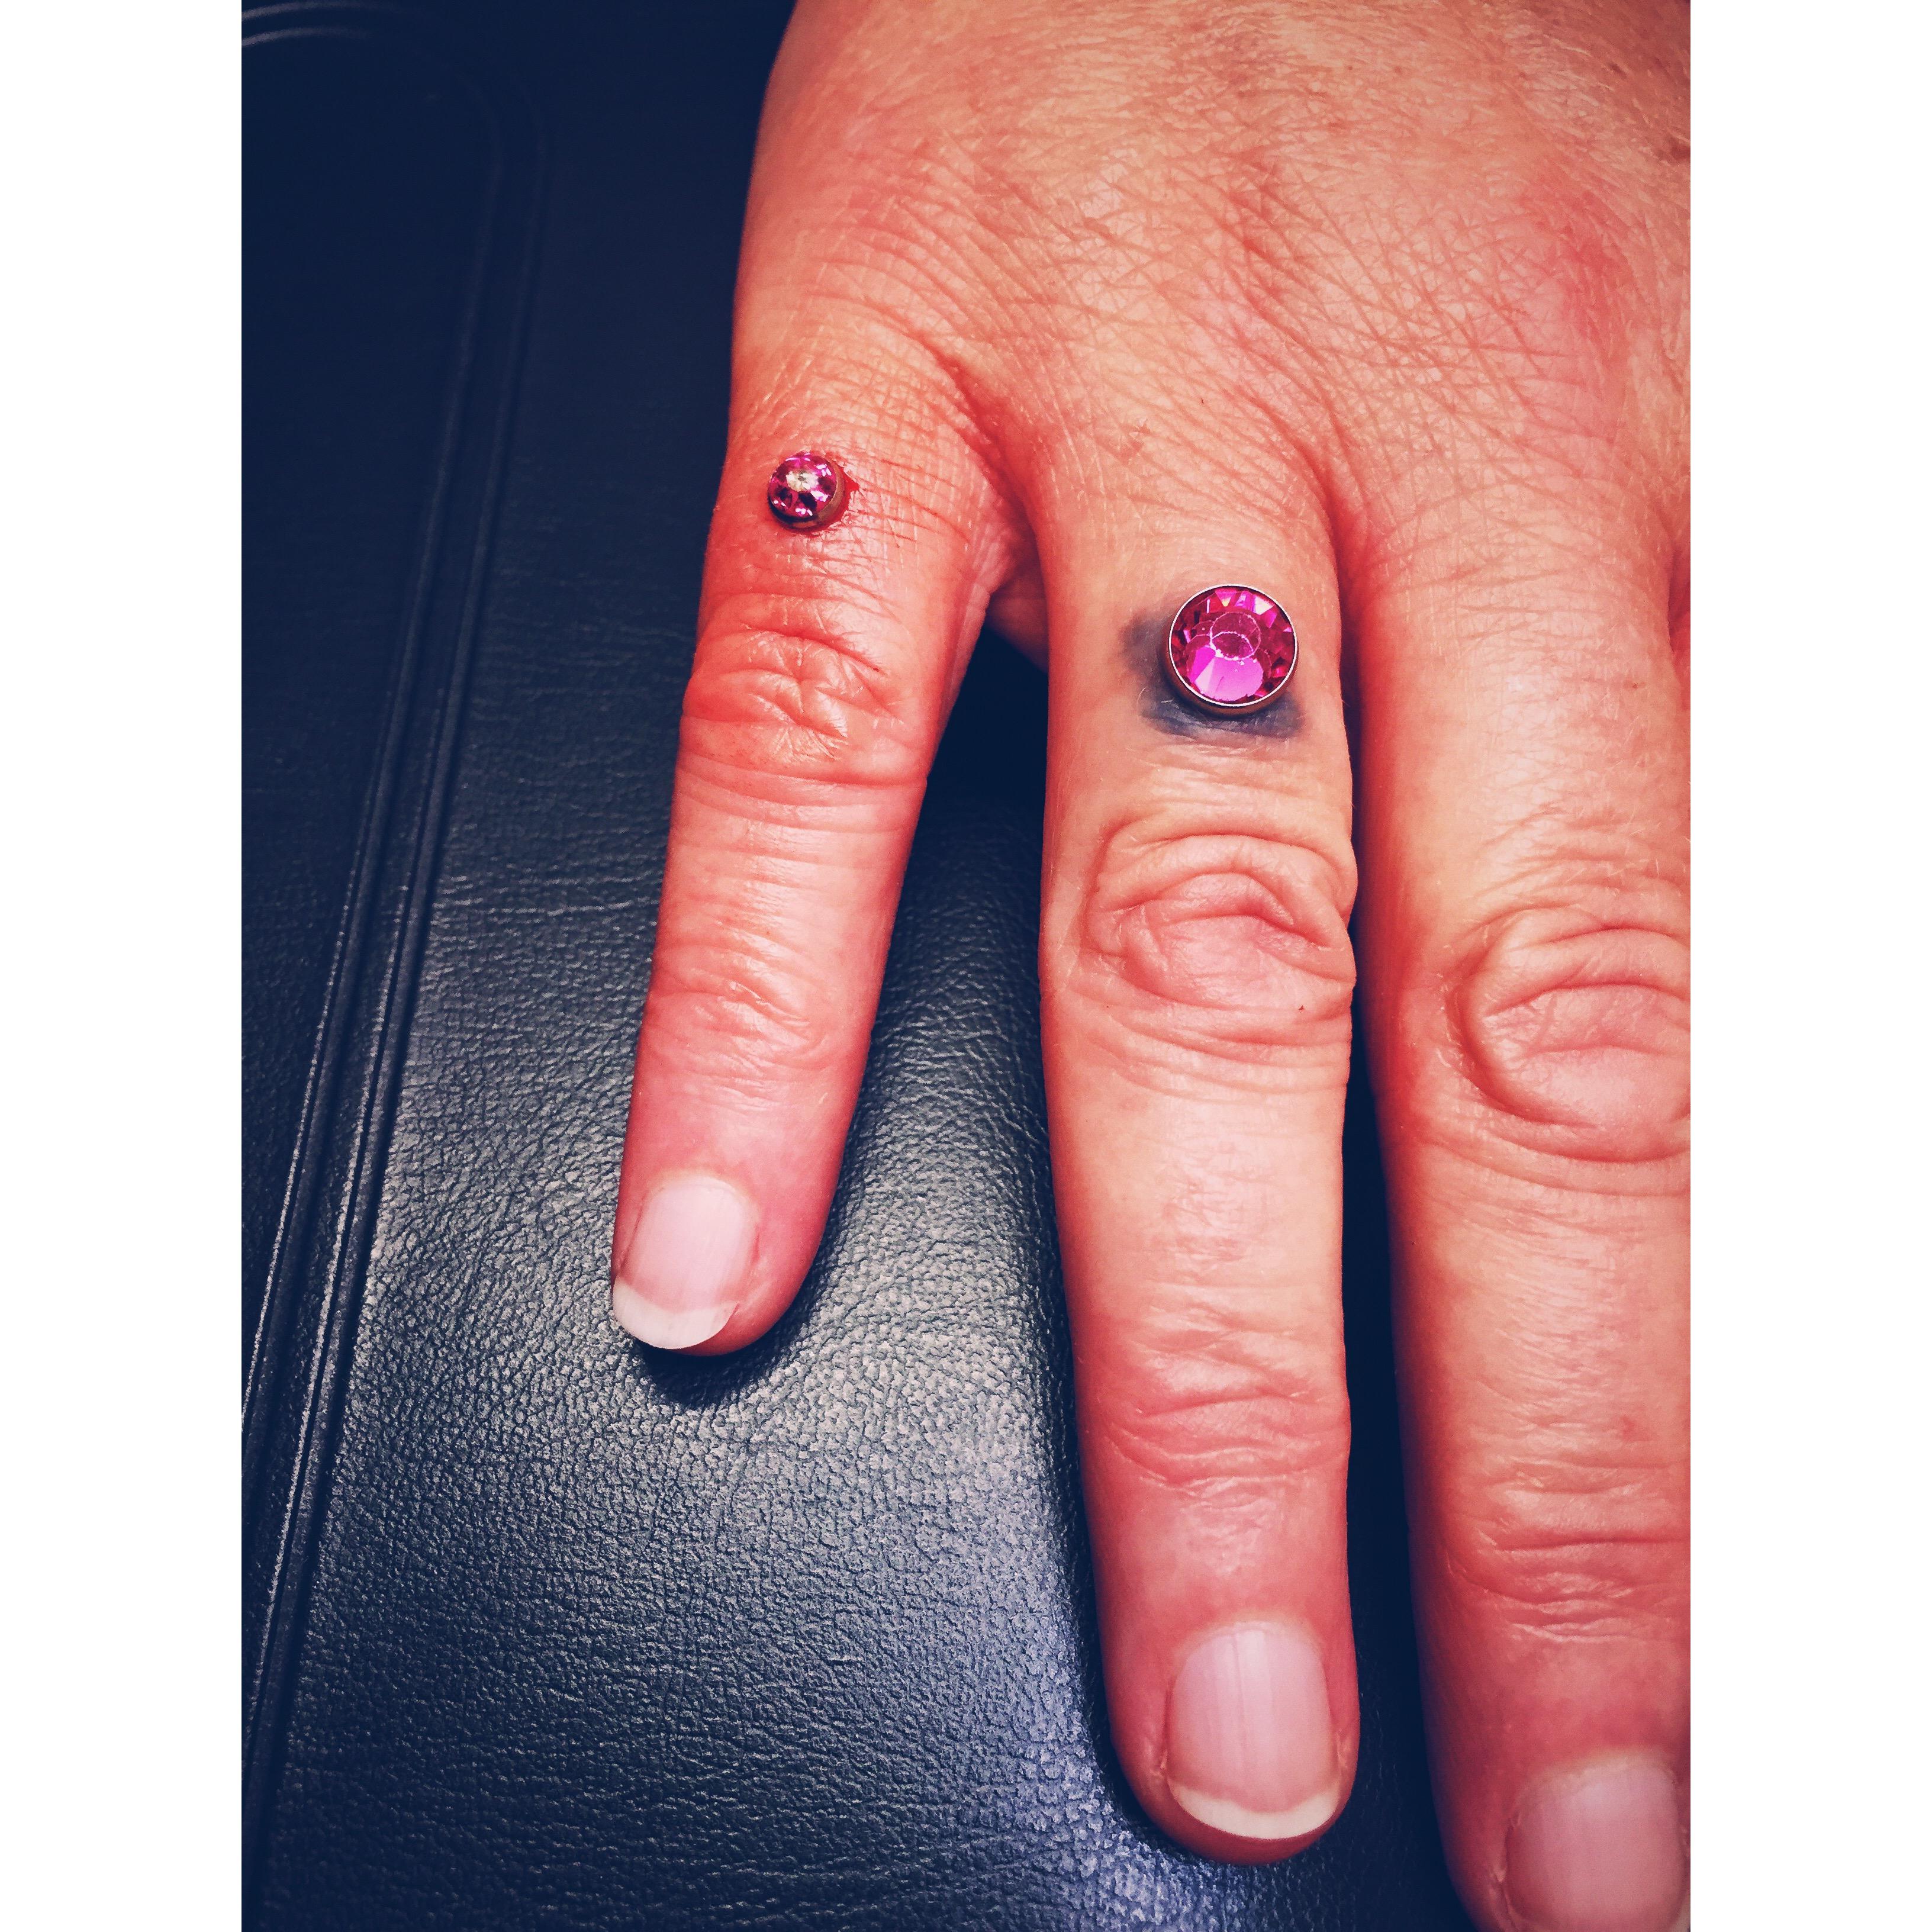 Donnau0027s Additional Pinky Dermal Piercing